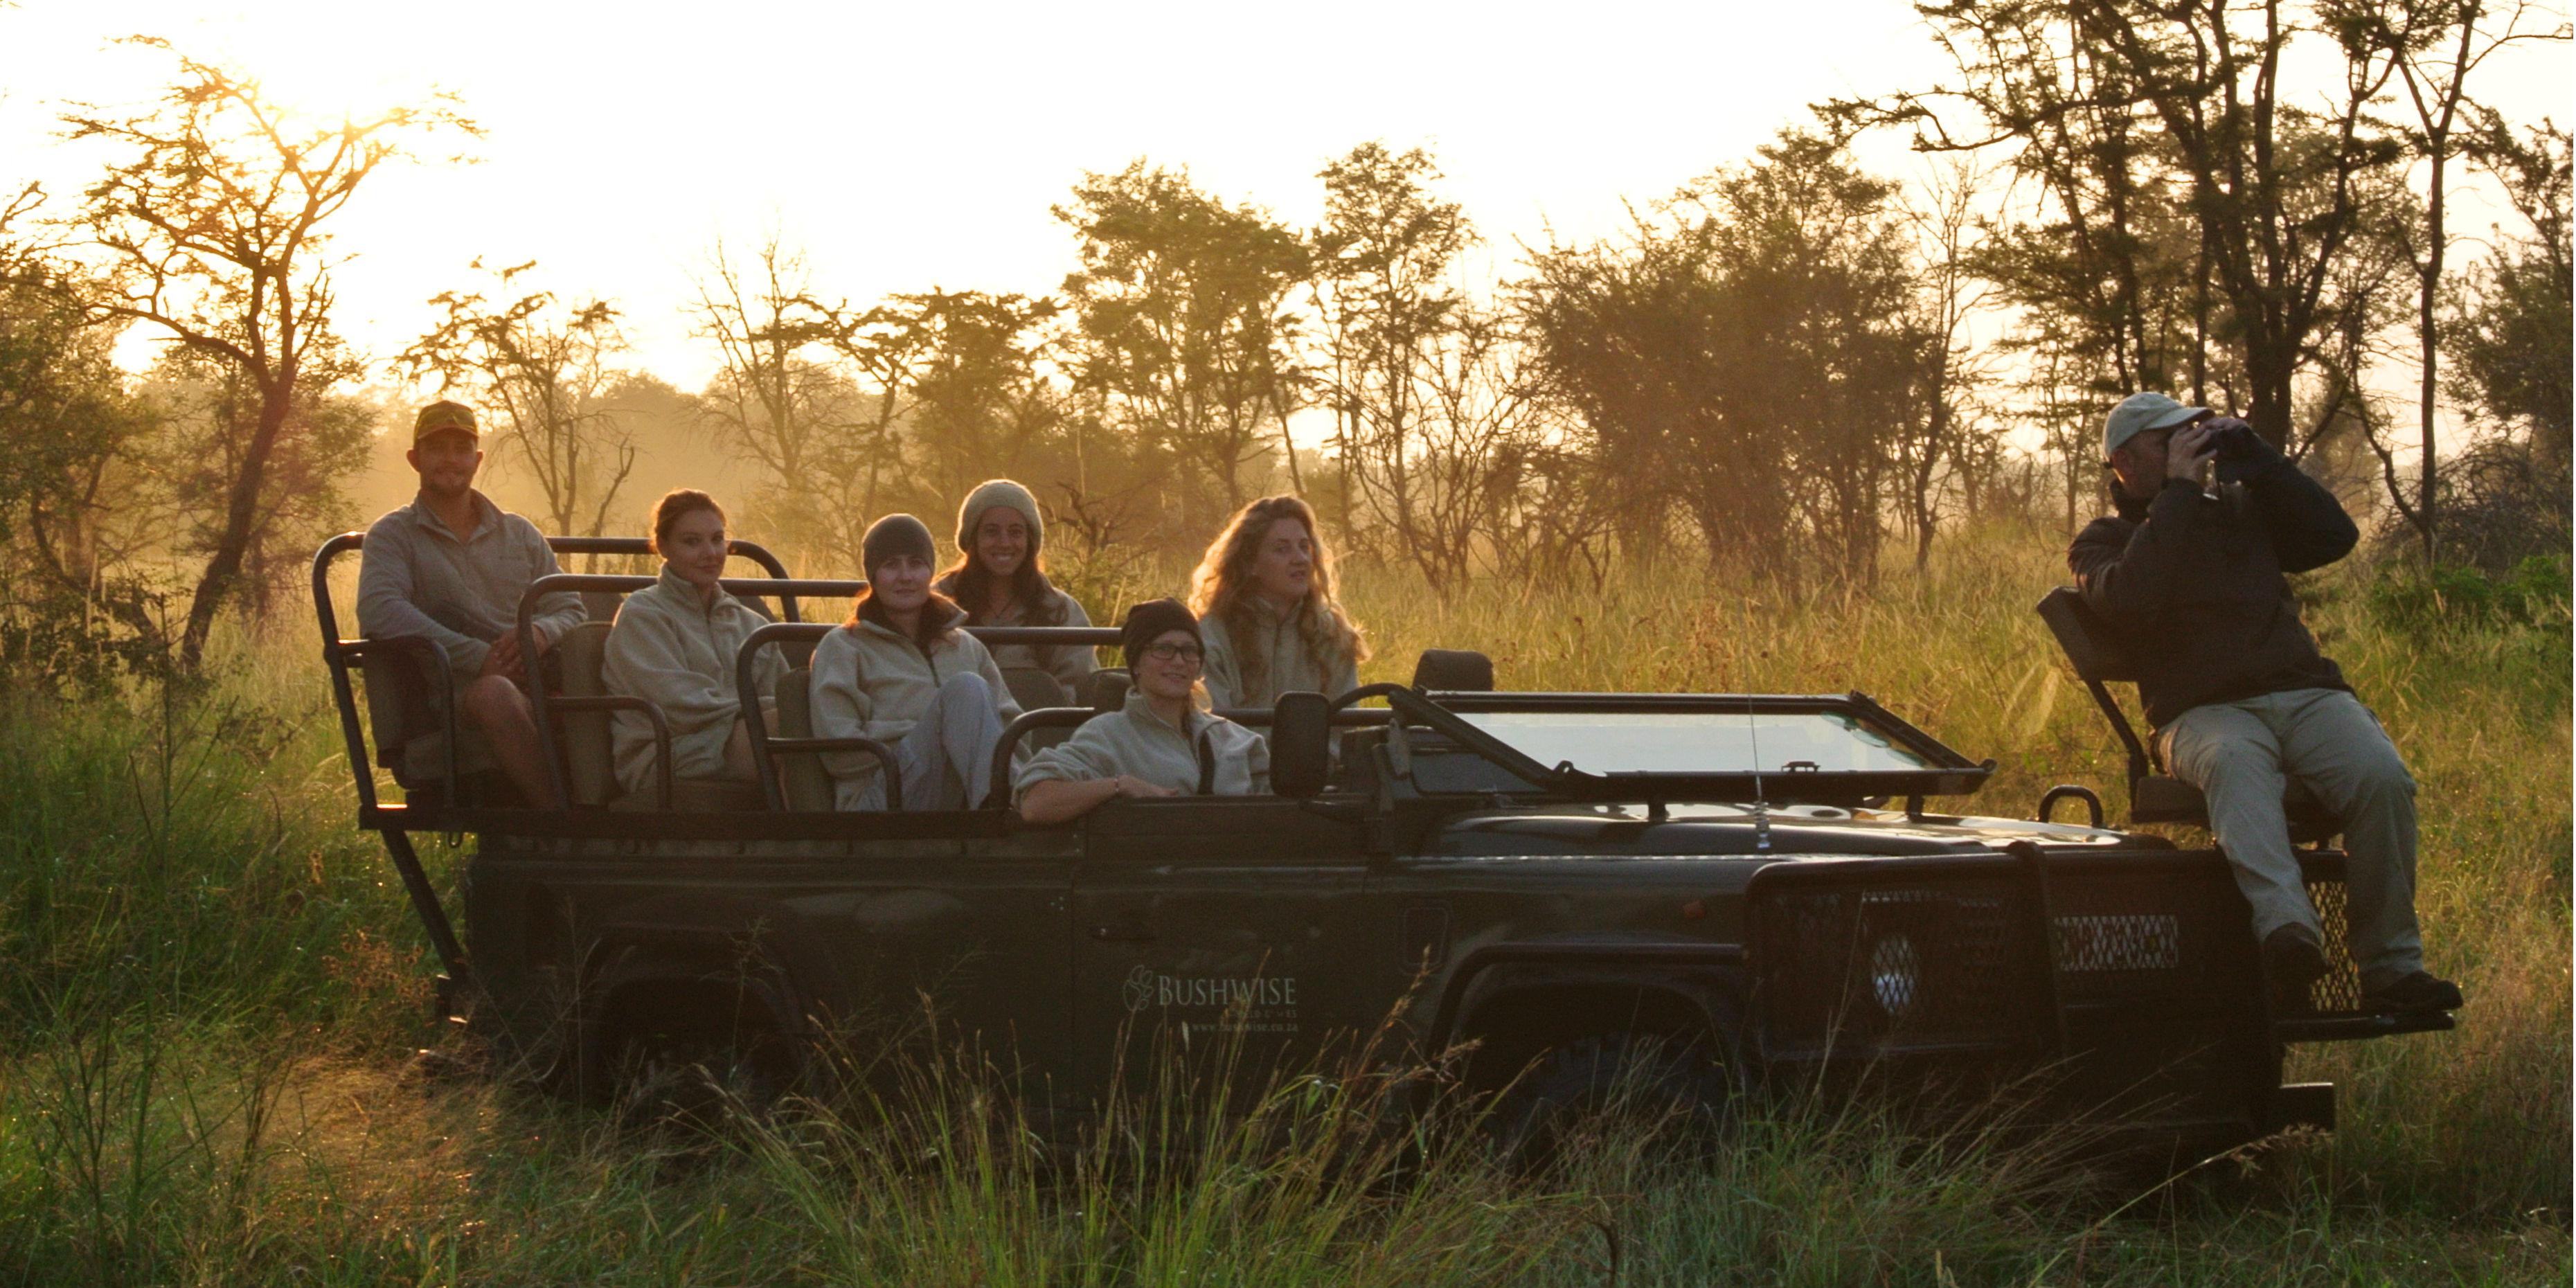 wildlife conservation jobs in africa